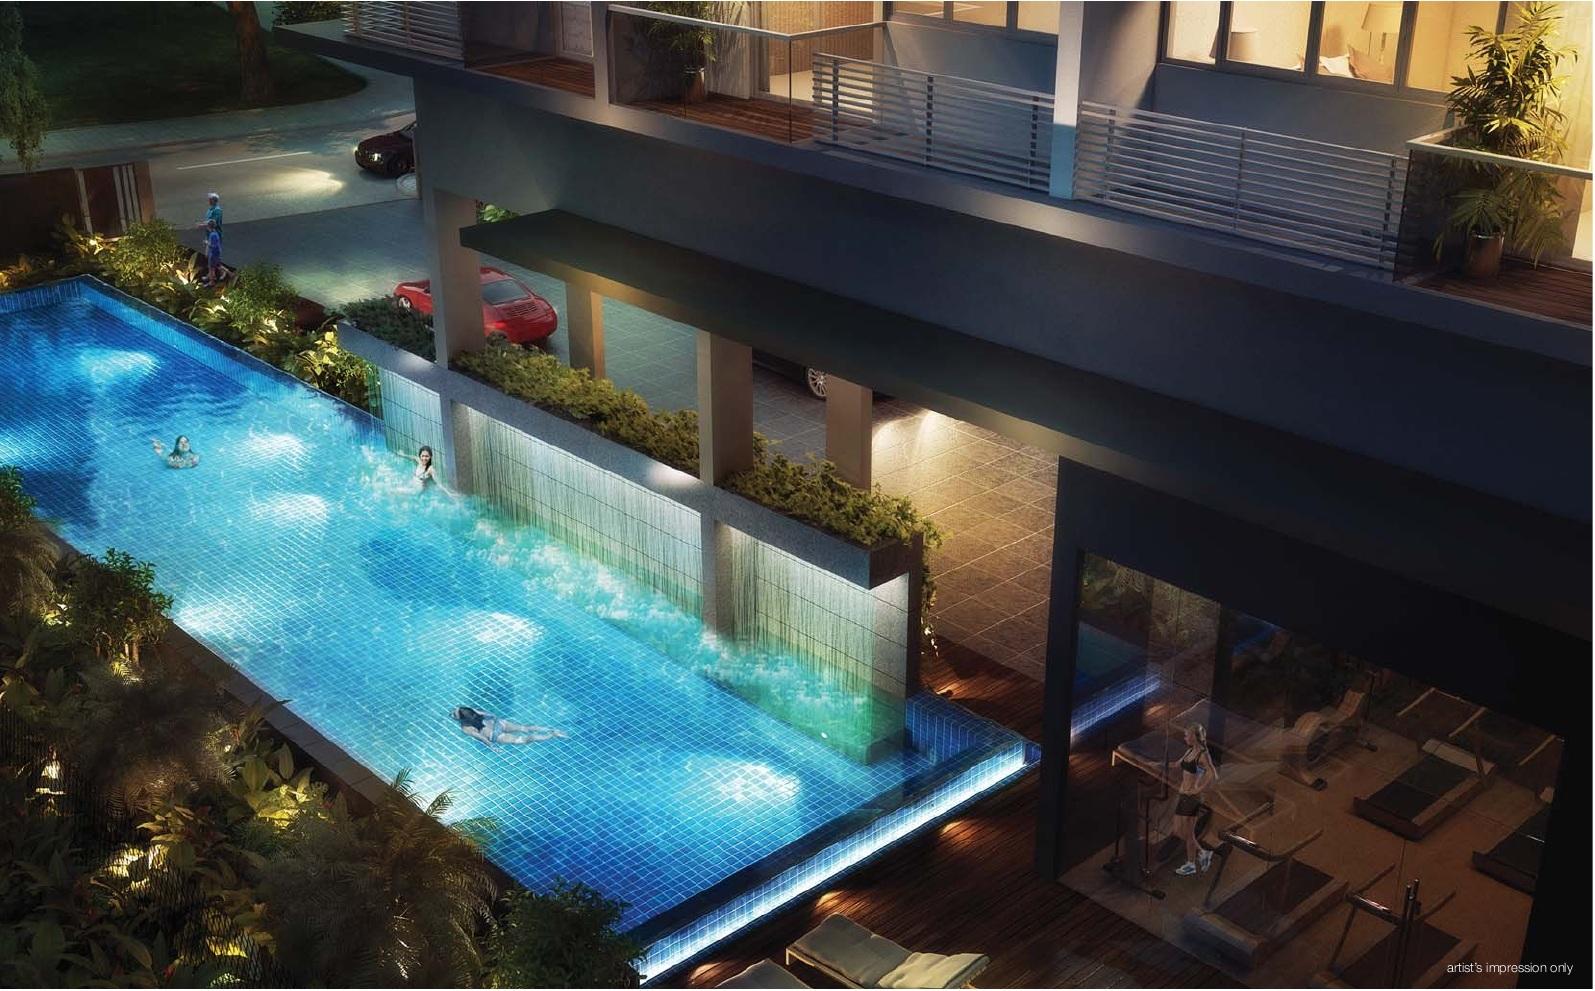 Laverne's Loft Pool lavernes loft Lavernes Loft Singapore | Showflat Hotline +65 61007122 lavernes loft pool